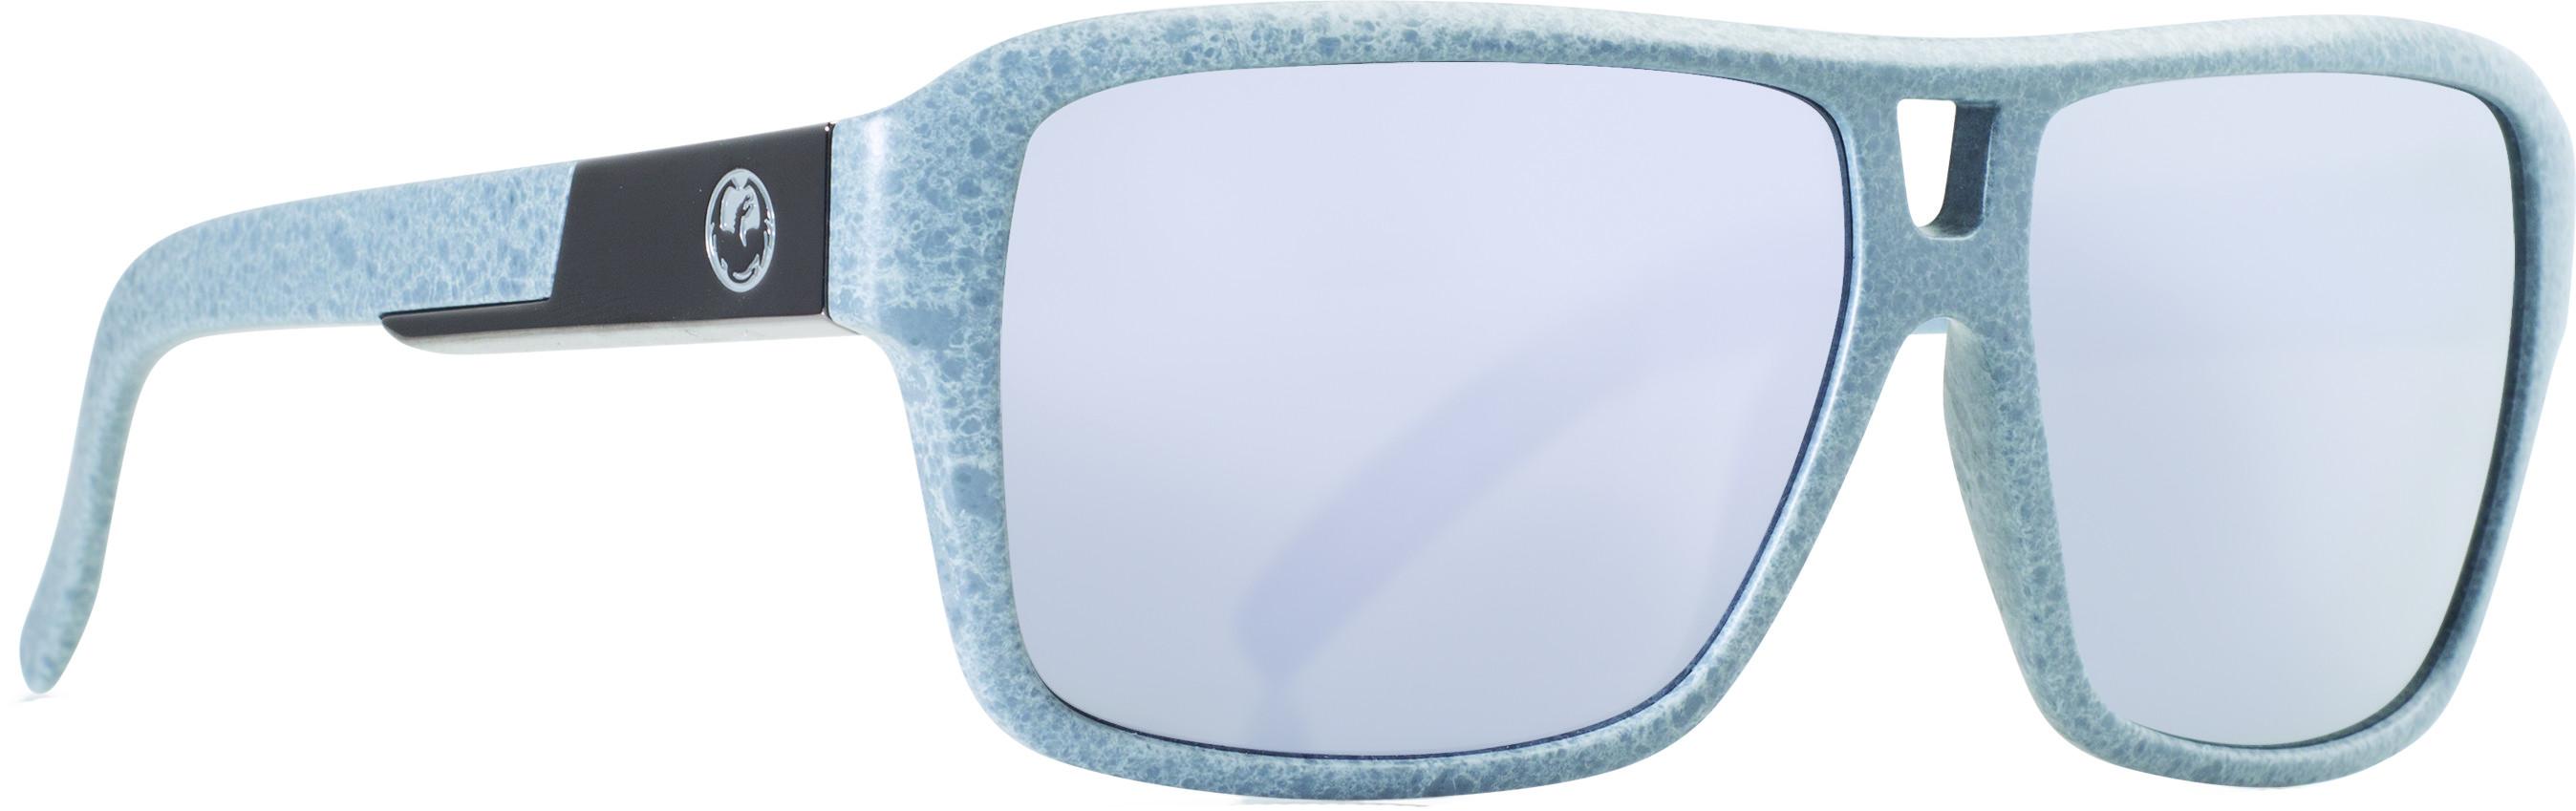 02b1174de18a Dragon Alliance The Jam Sunglasses | Rullo Custom Cycles